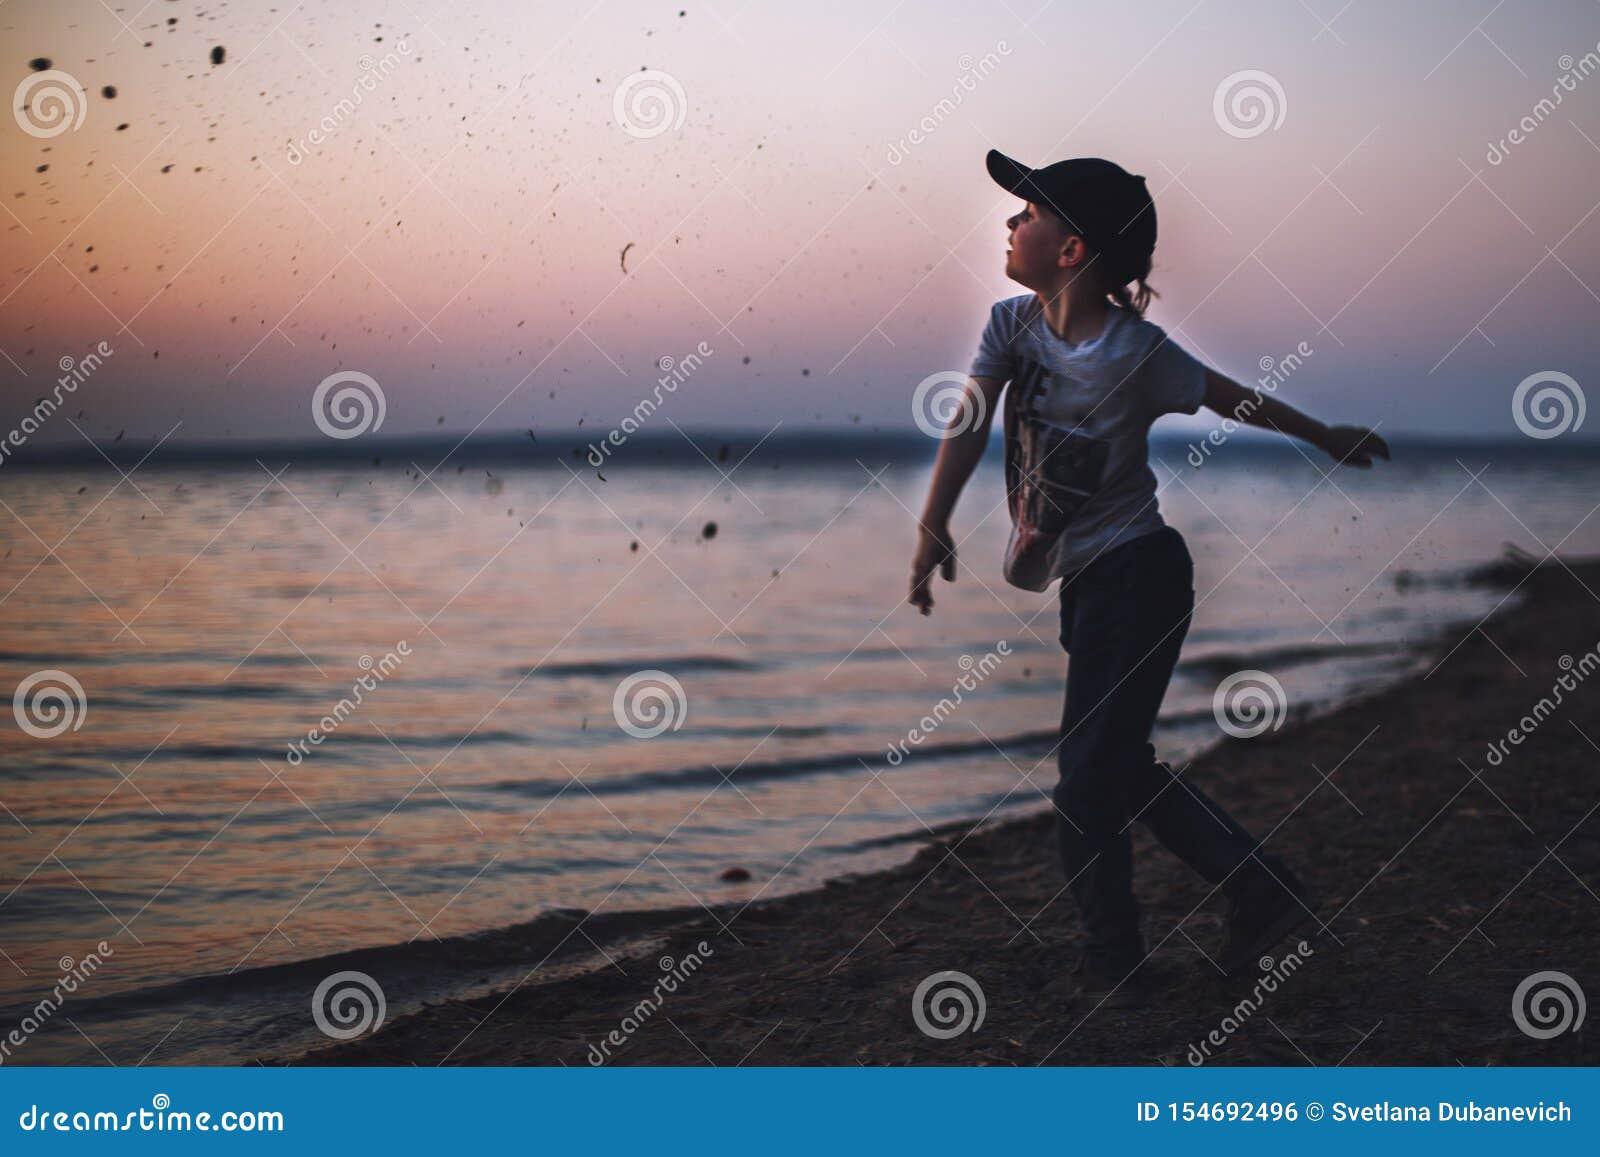 O menino na praia joga pedras na água